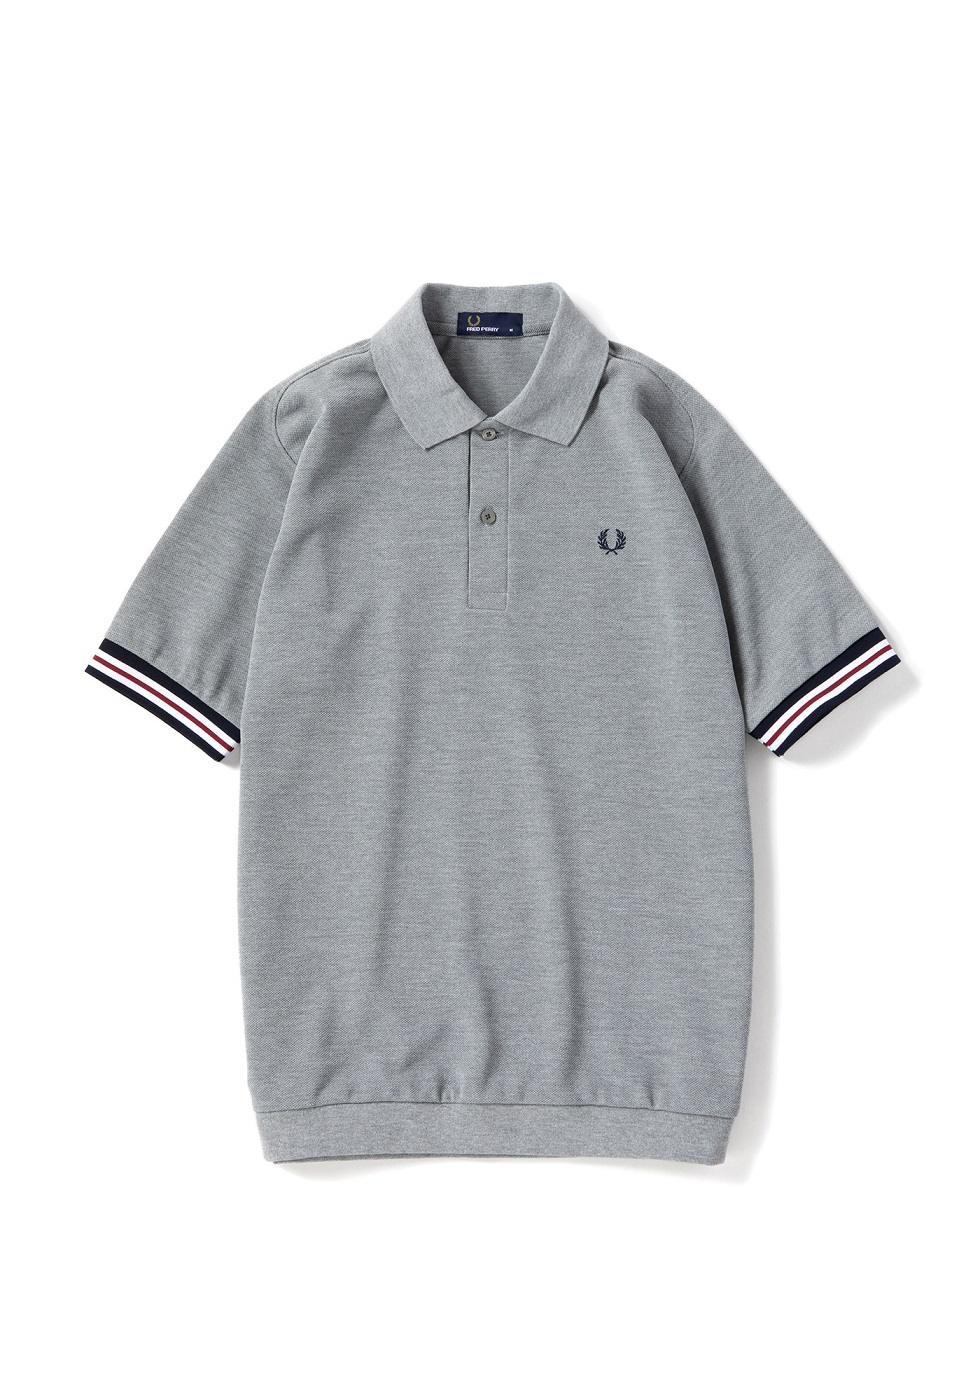 FRED PERRY(フレッドペリー) ポロシャツ